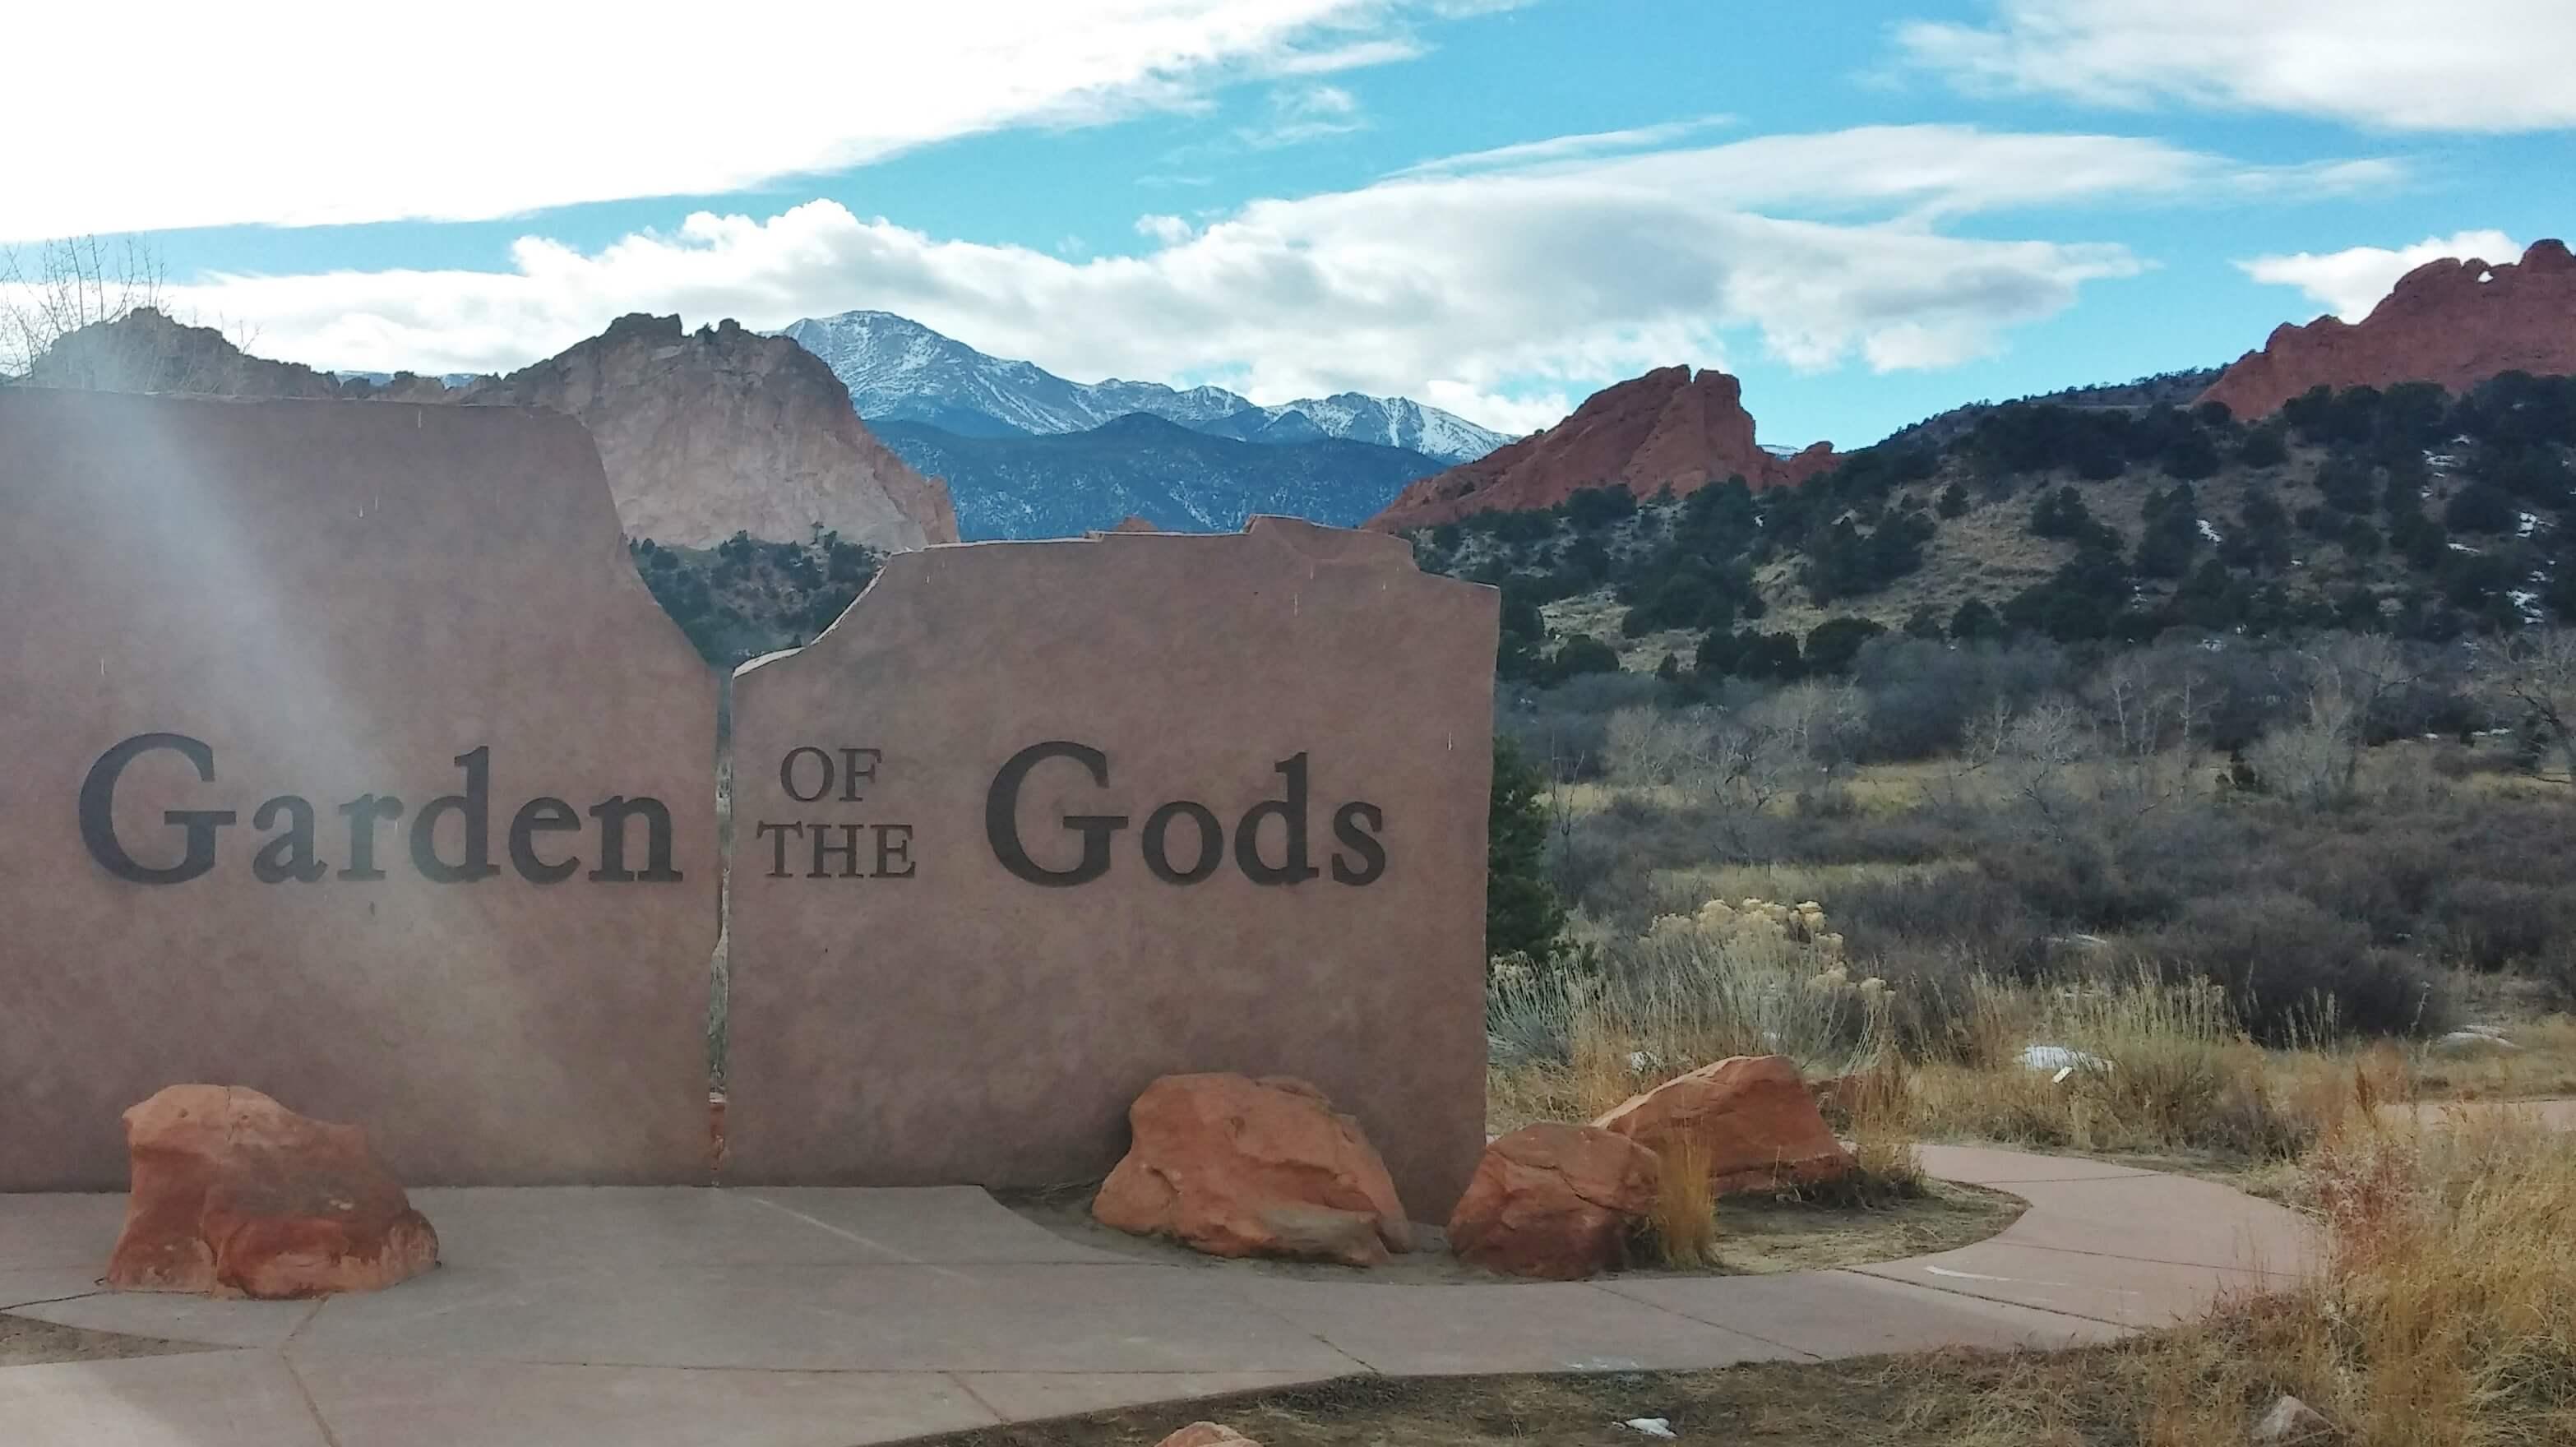 Mac and Mandi's Excellent Colorado Springs Adventure